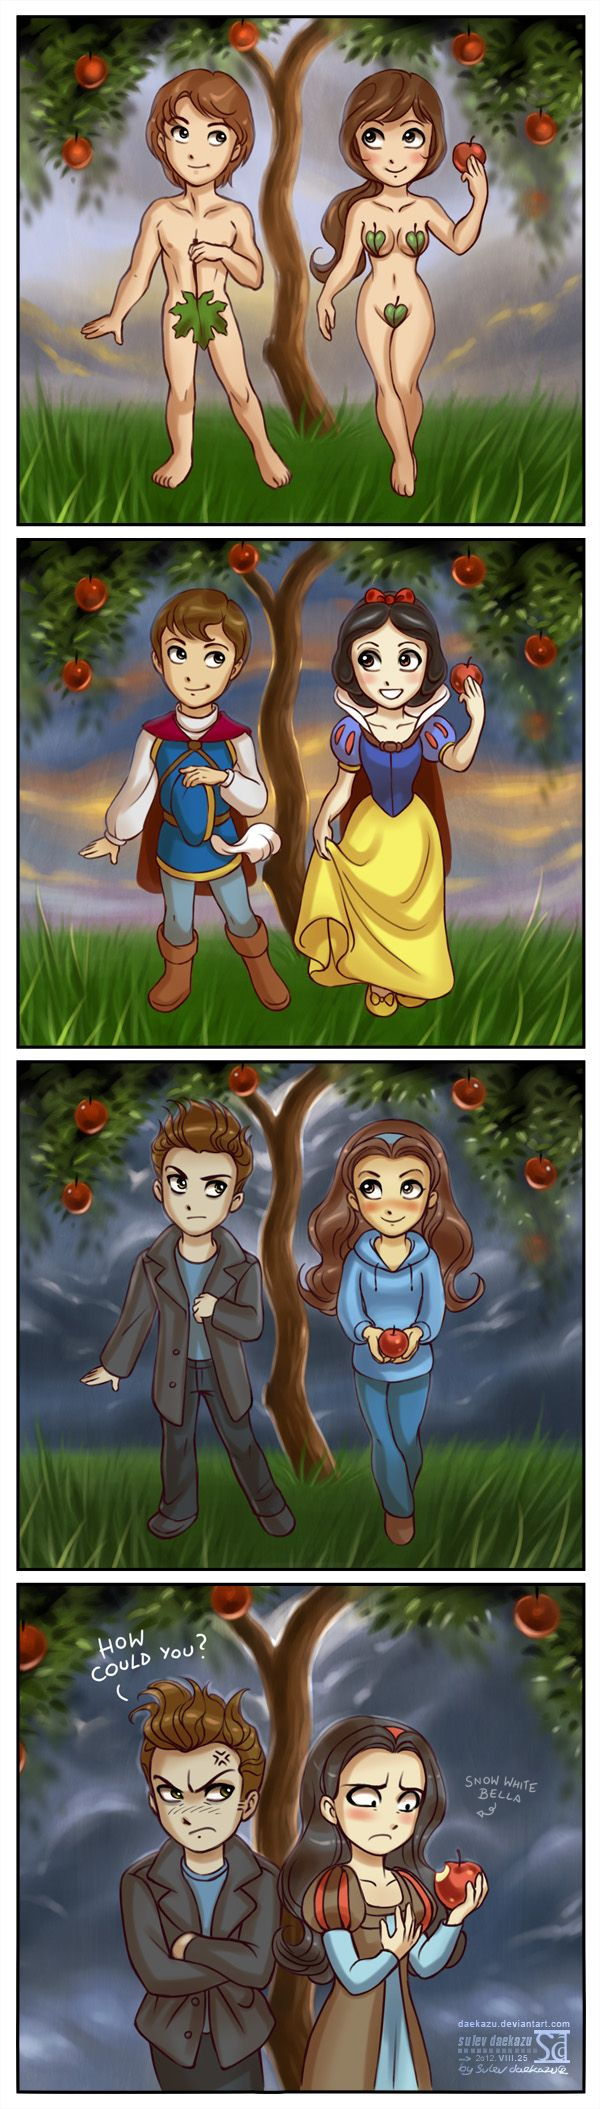 Adam & Eve / the Prince & Snow White / Edward & Bella / Edward & Snow White (Cross Overs by Daekazu @deviantART) #SnowWhiteAndTheSevenDwarfs #SnowWhiteAndTheHuntsman #Twilight